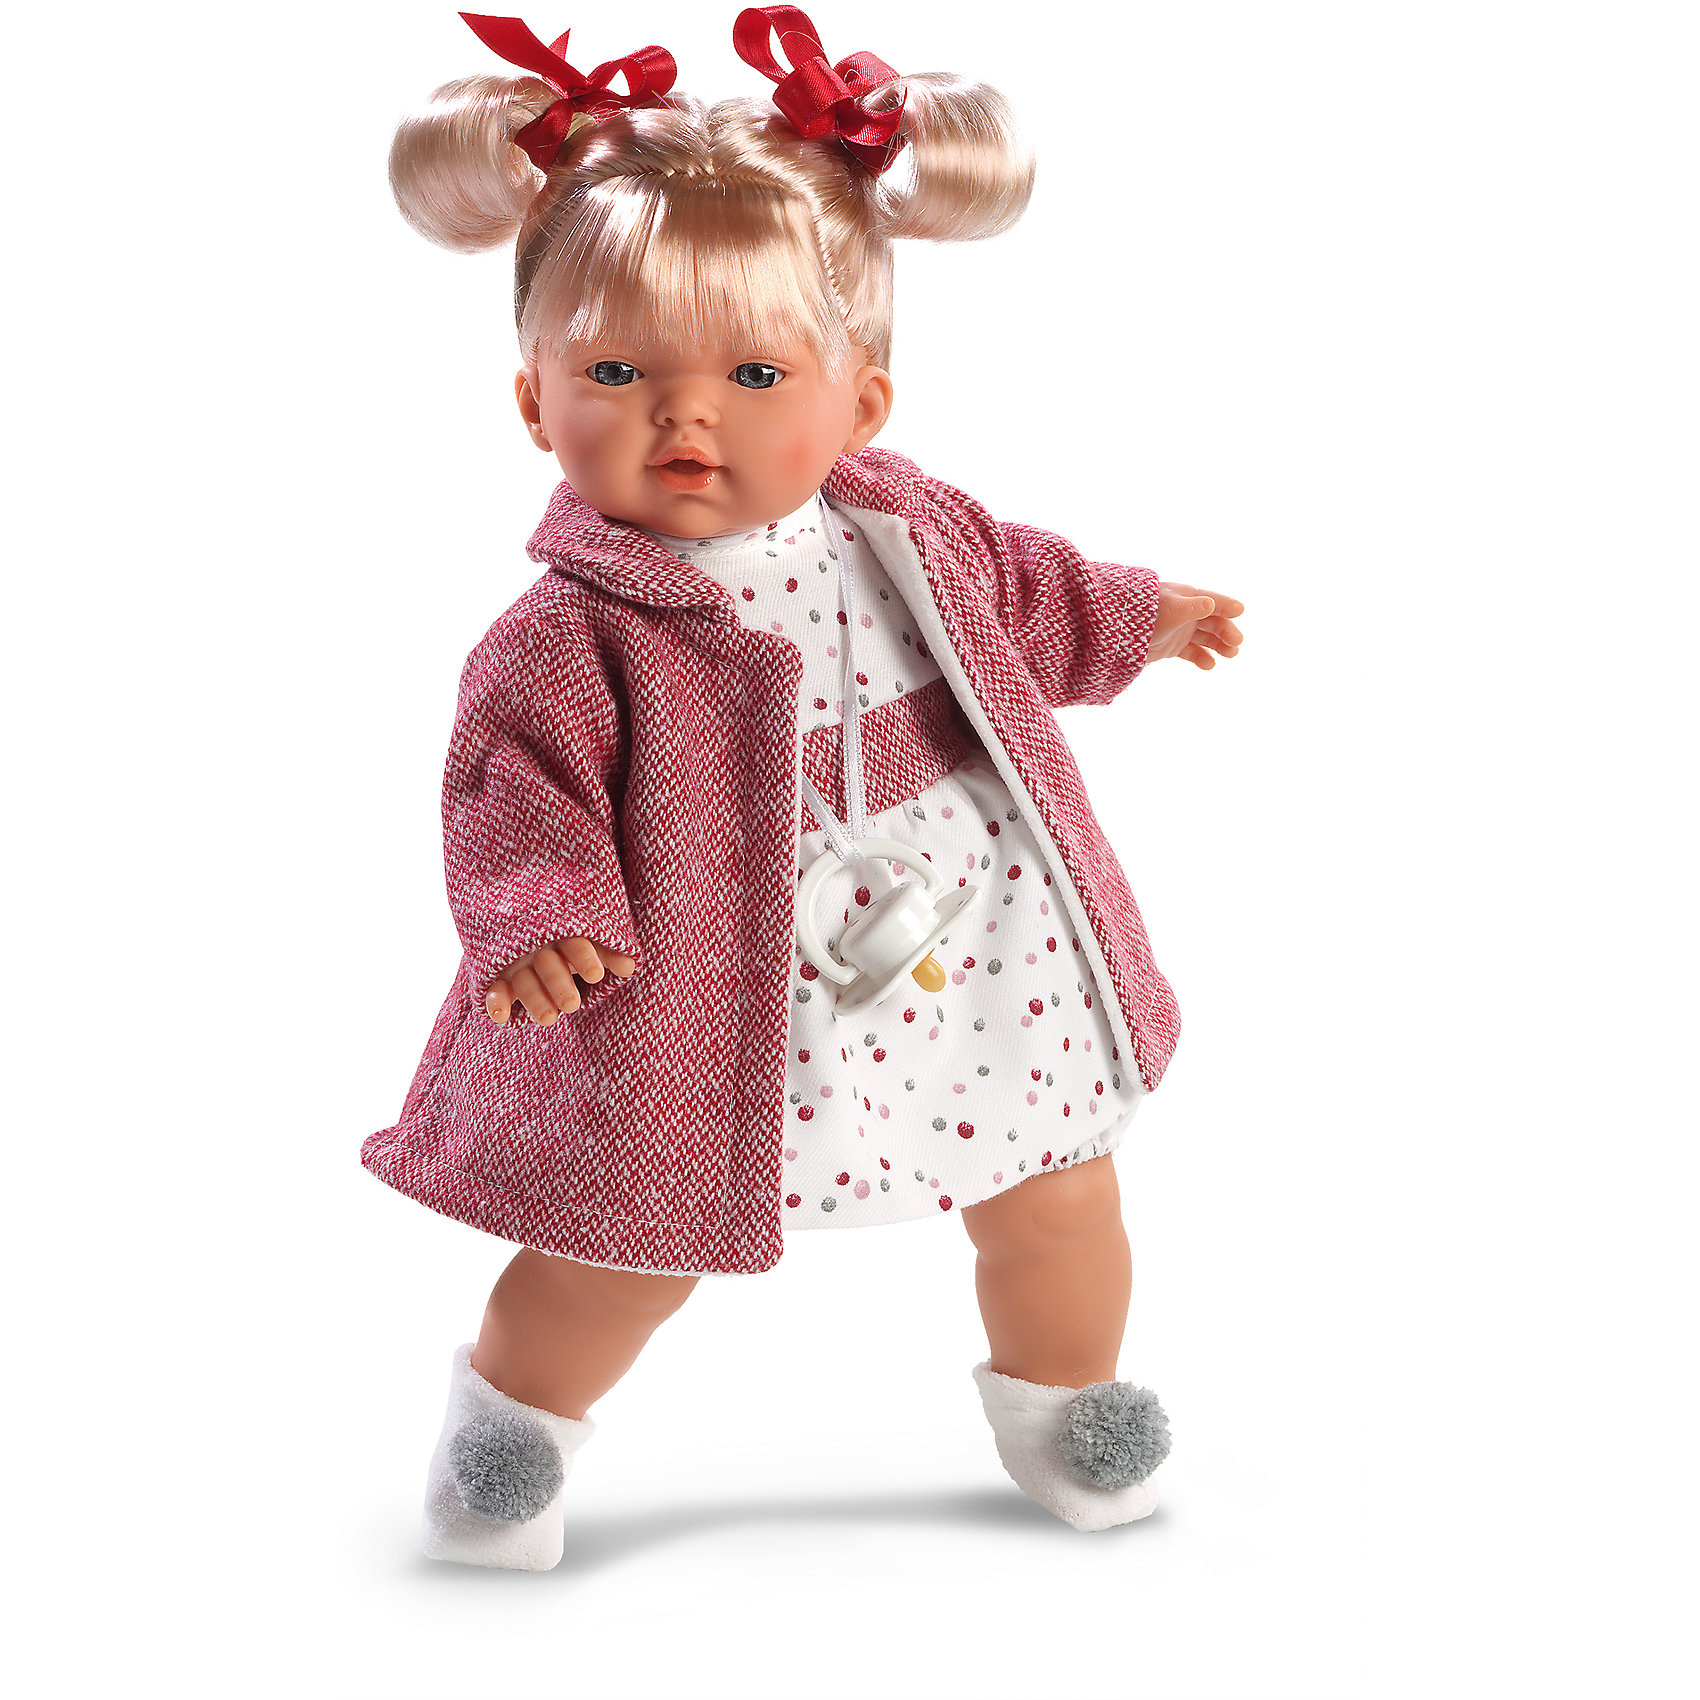 Llorens Кукла Татьяна, 33 см, Llorens куклы и одежда для кукол llorens кукла алиса 33 см со звуком